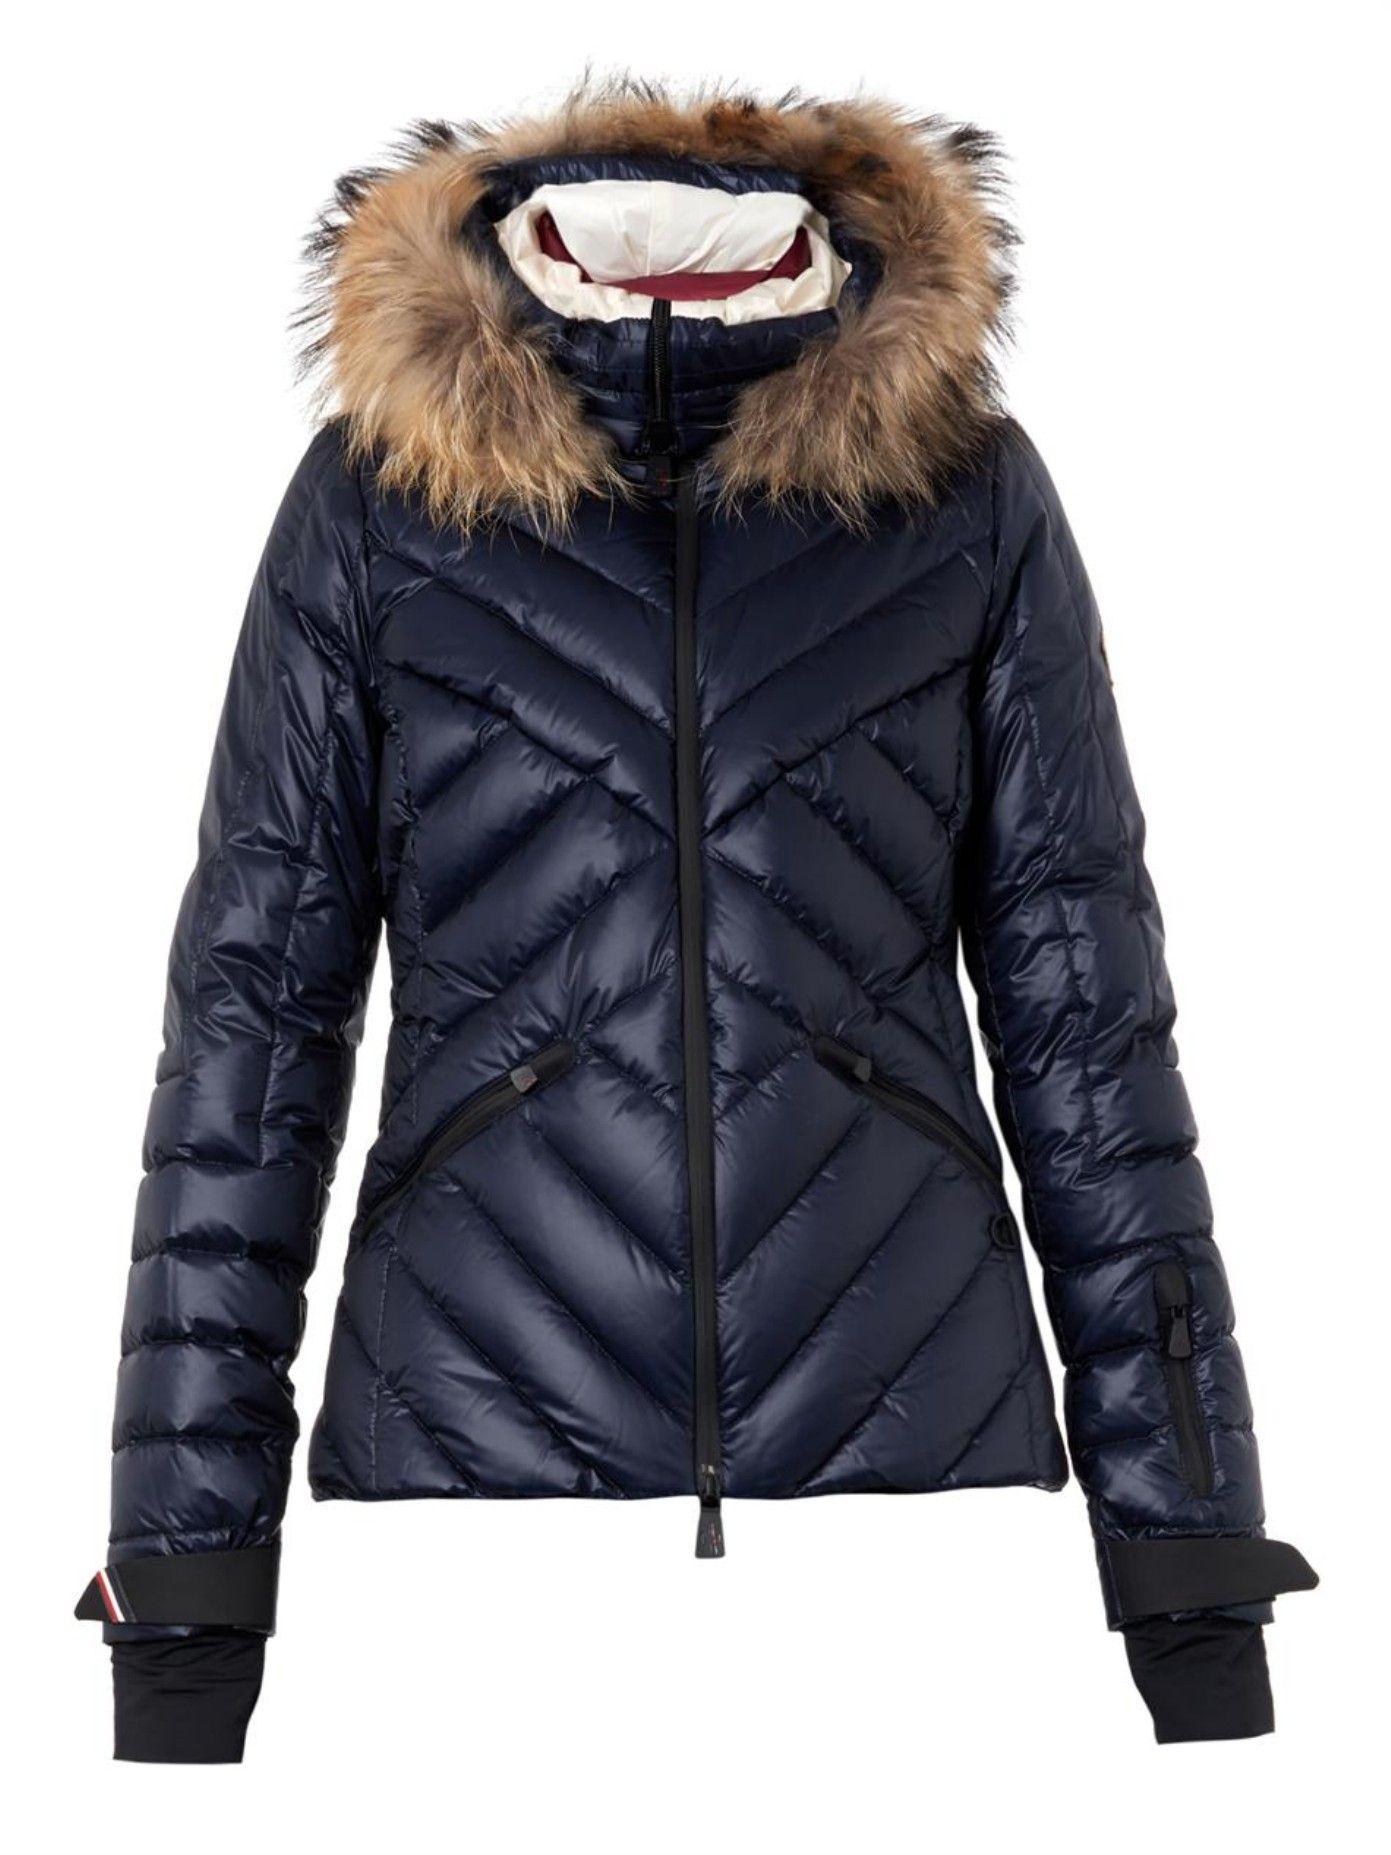 17cf265b8 Makalu fur-trimmed quilted down jacket | Moncler Grenoble ...